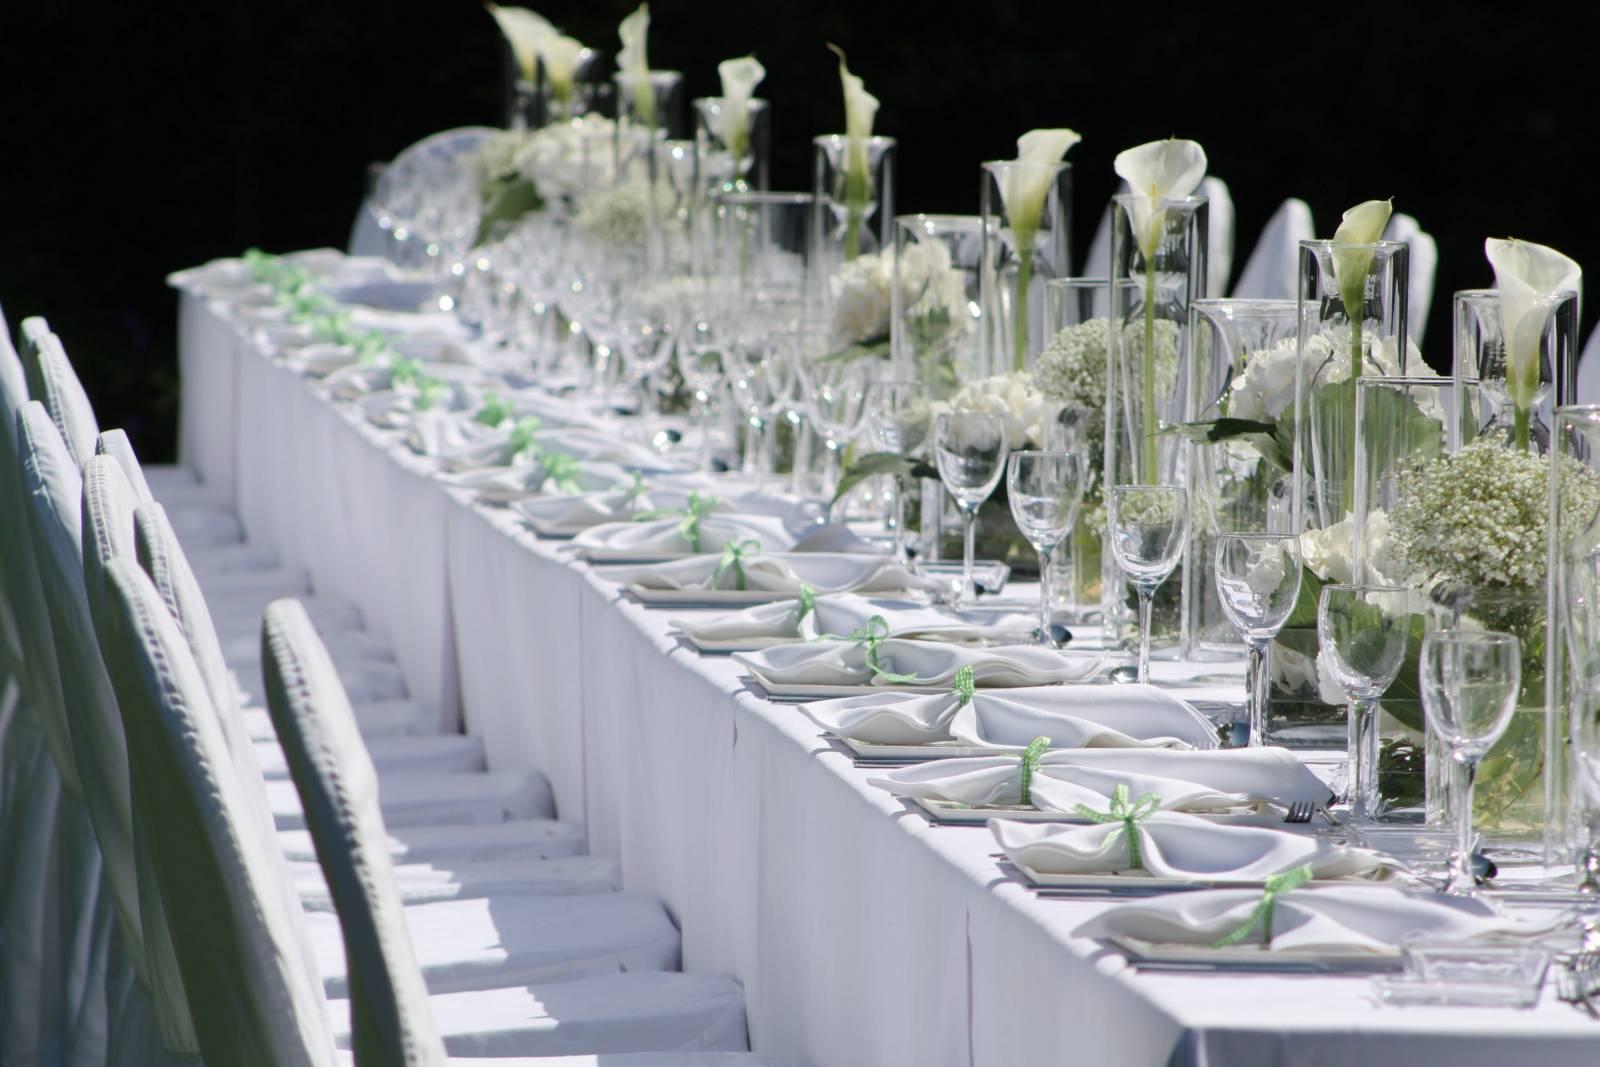 Flinckheuvel - Feestzaal 's Gravenwezel -  House of Weddings - 8